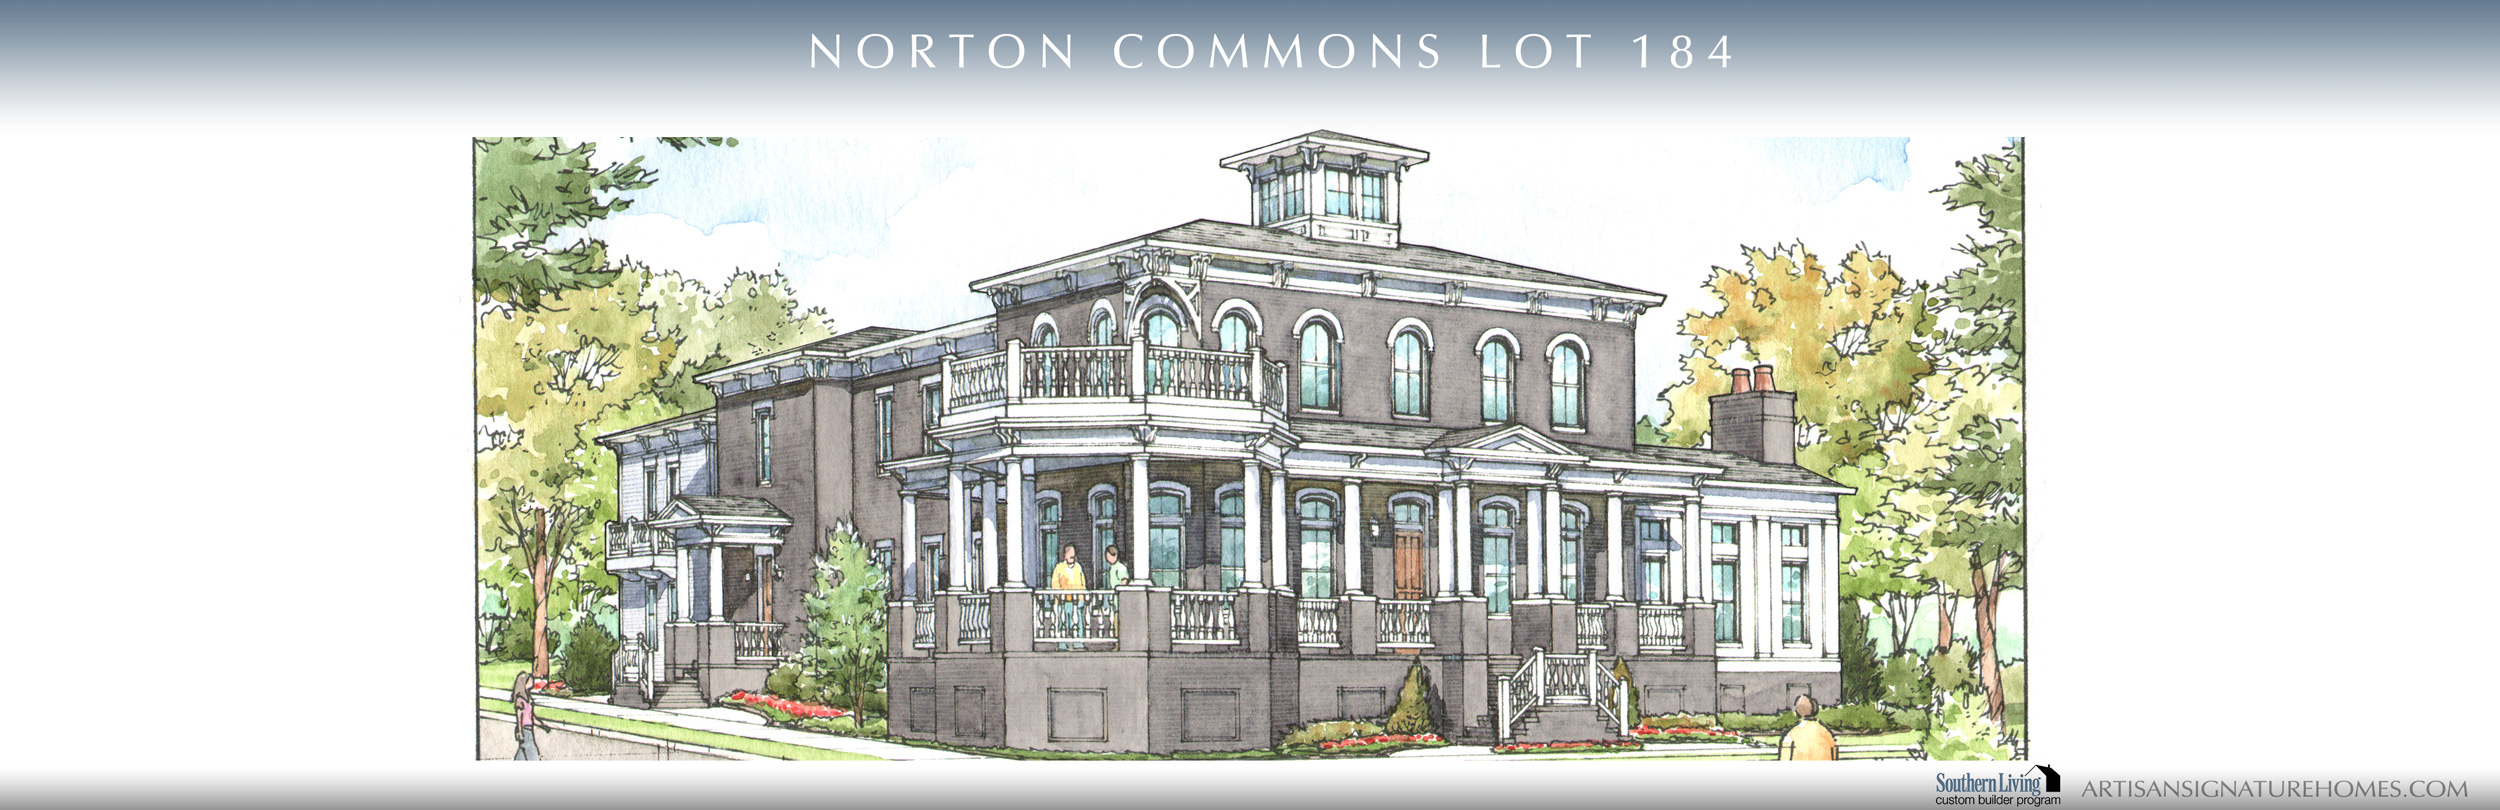 Norton Commons Lot 184 on Custom Home Floor Plans